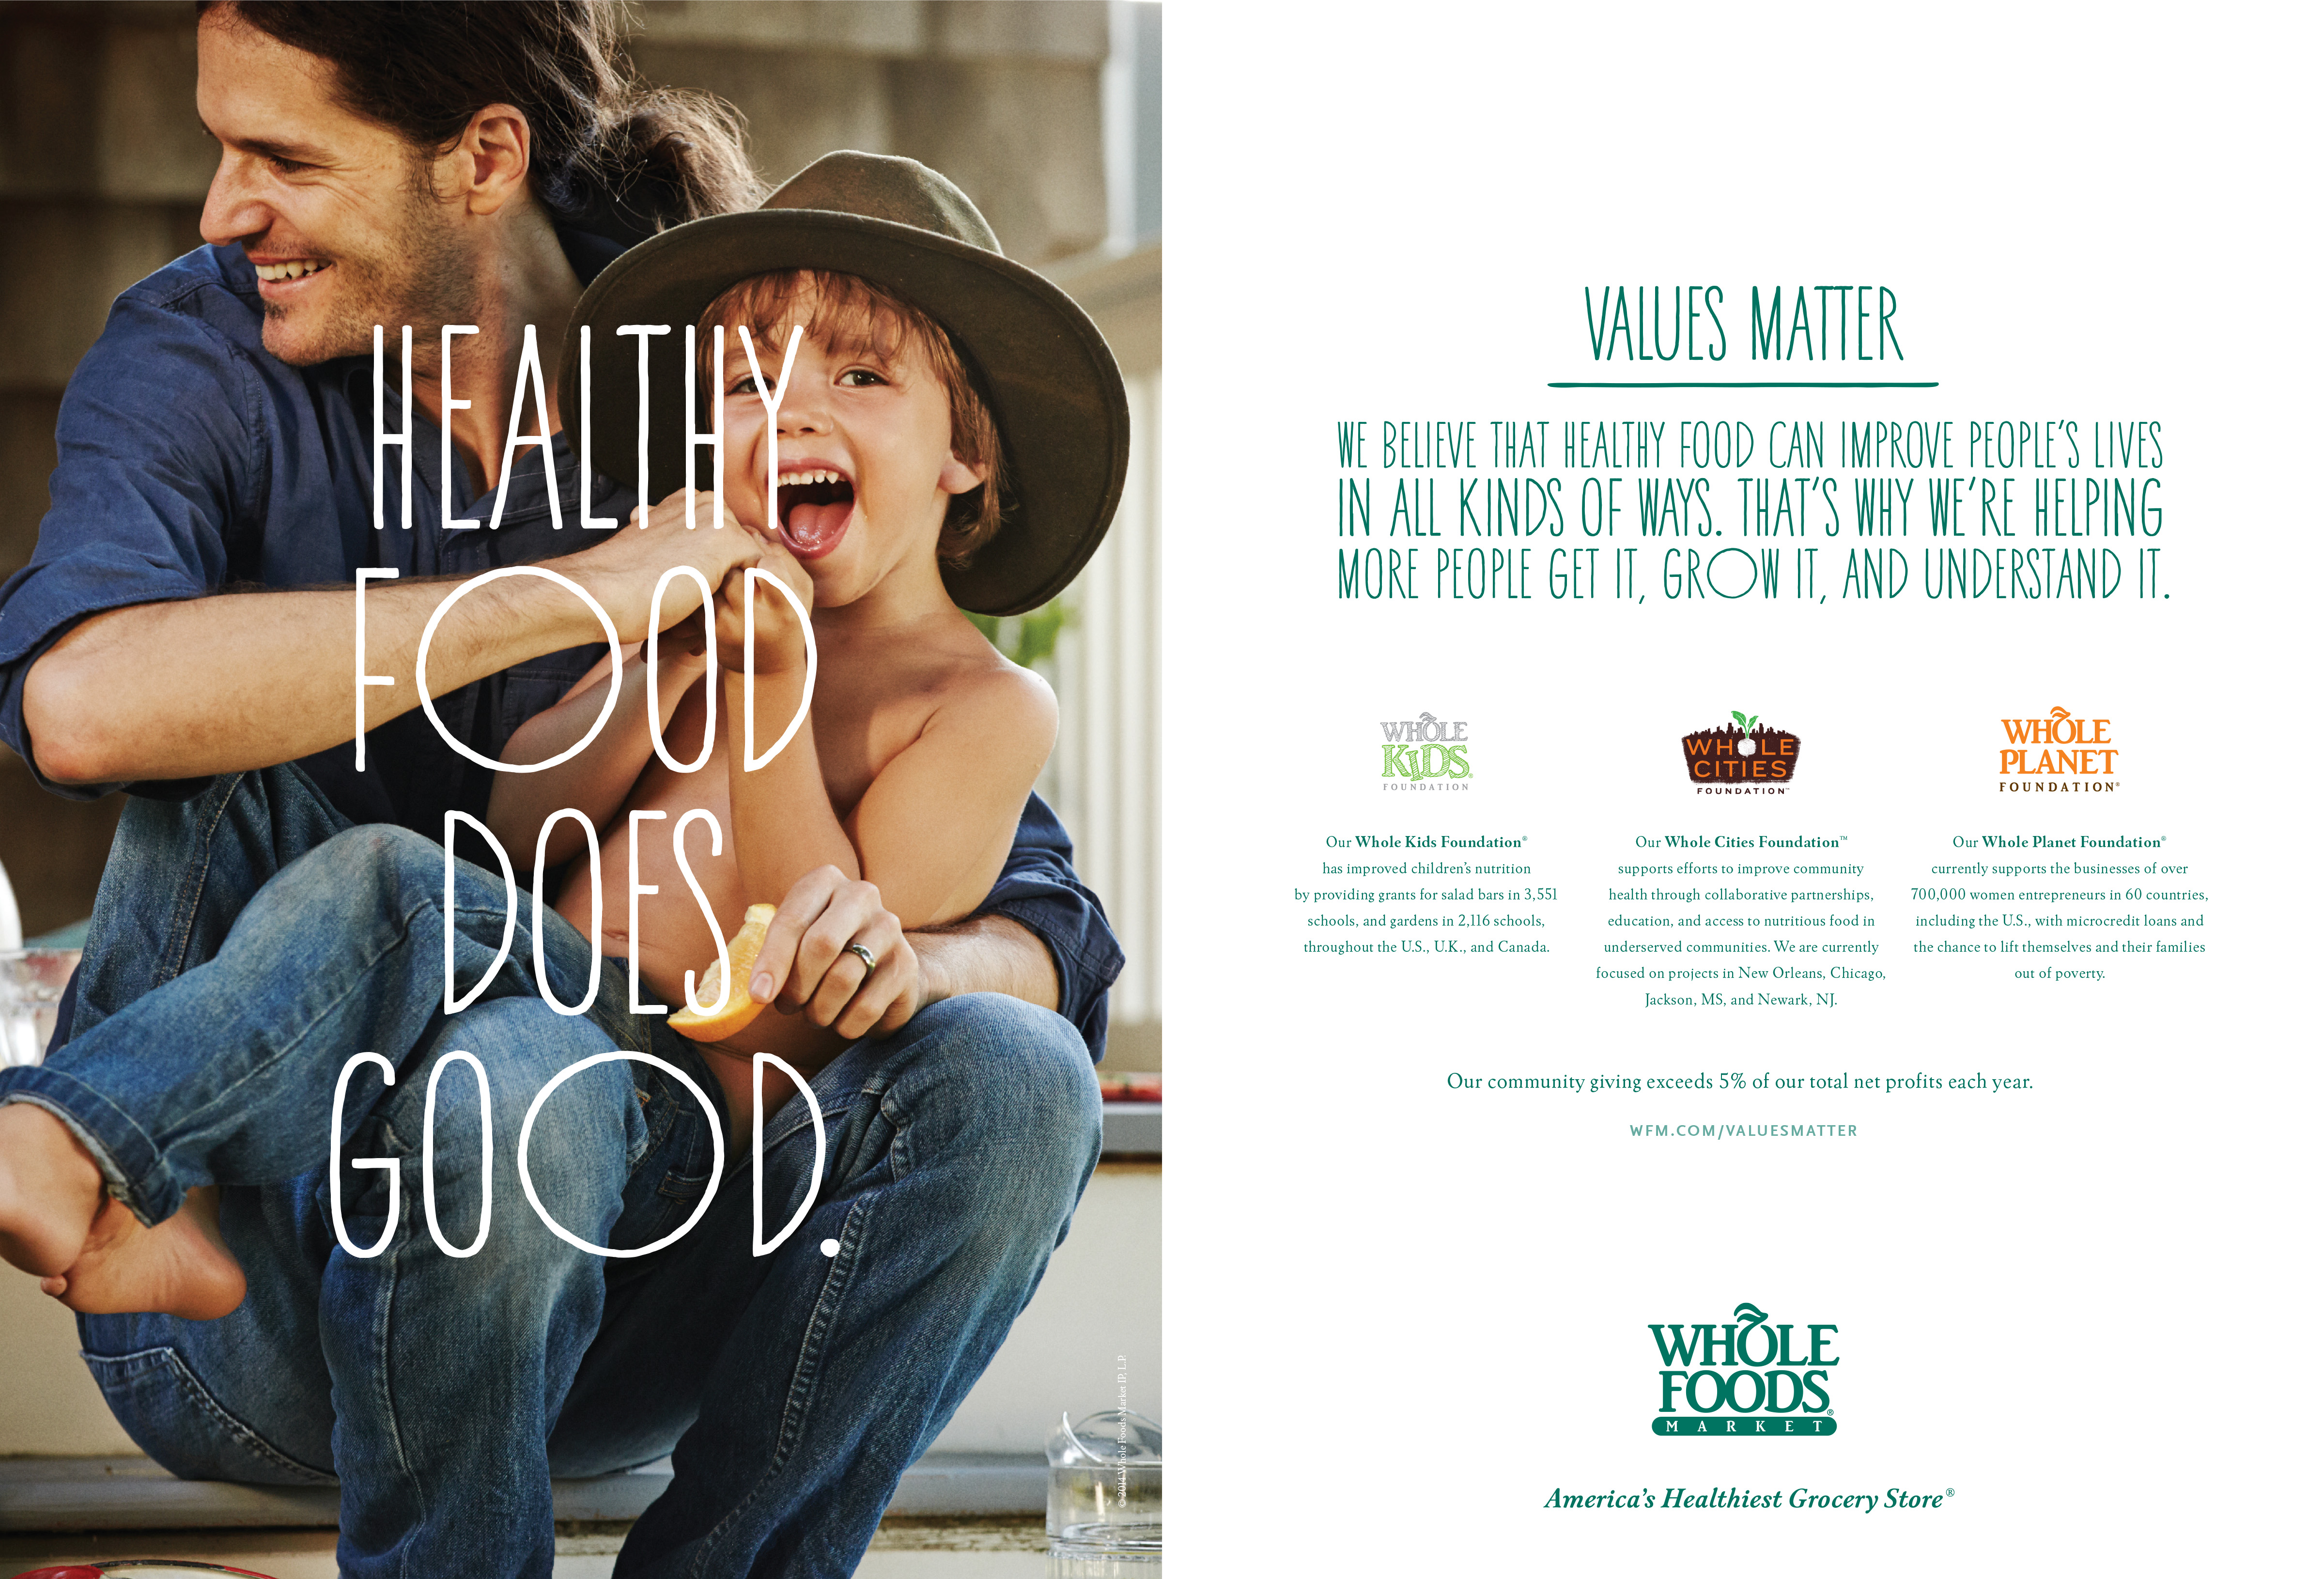 wfm_healthy_food_does_good-jpg